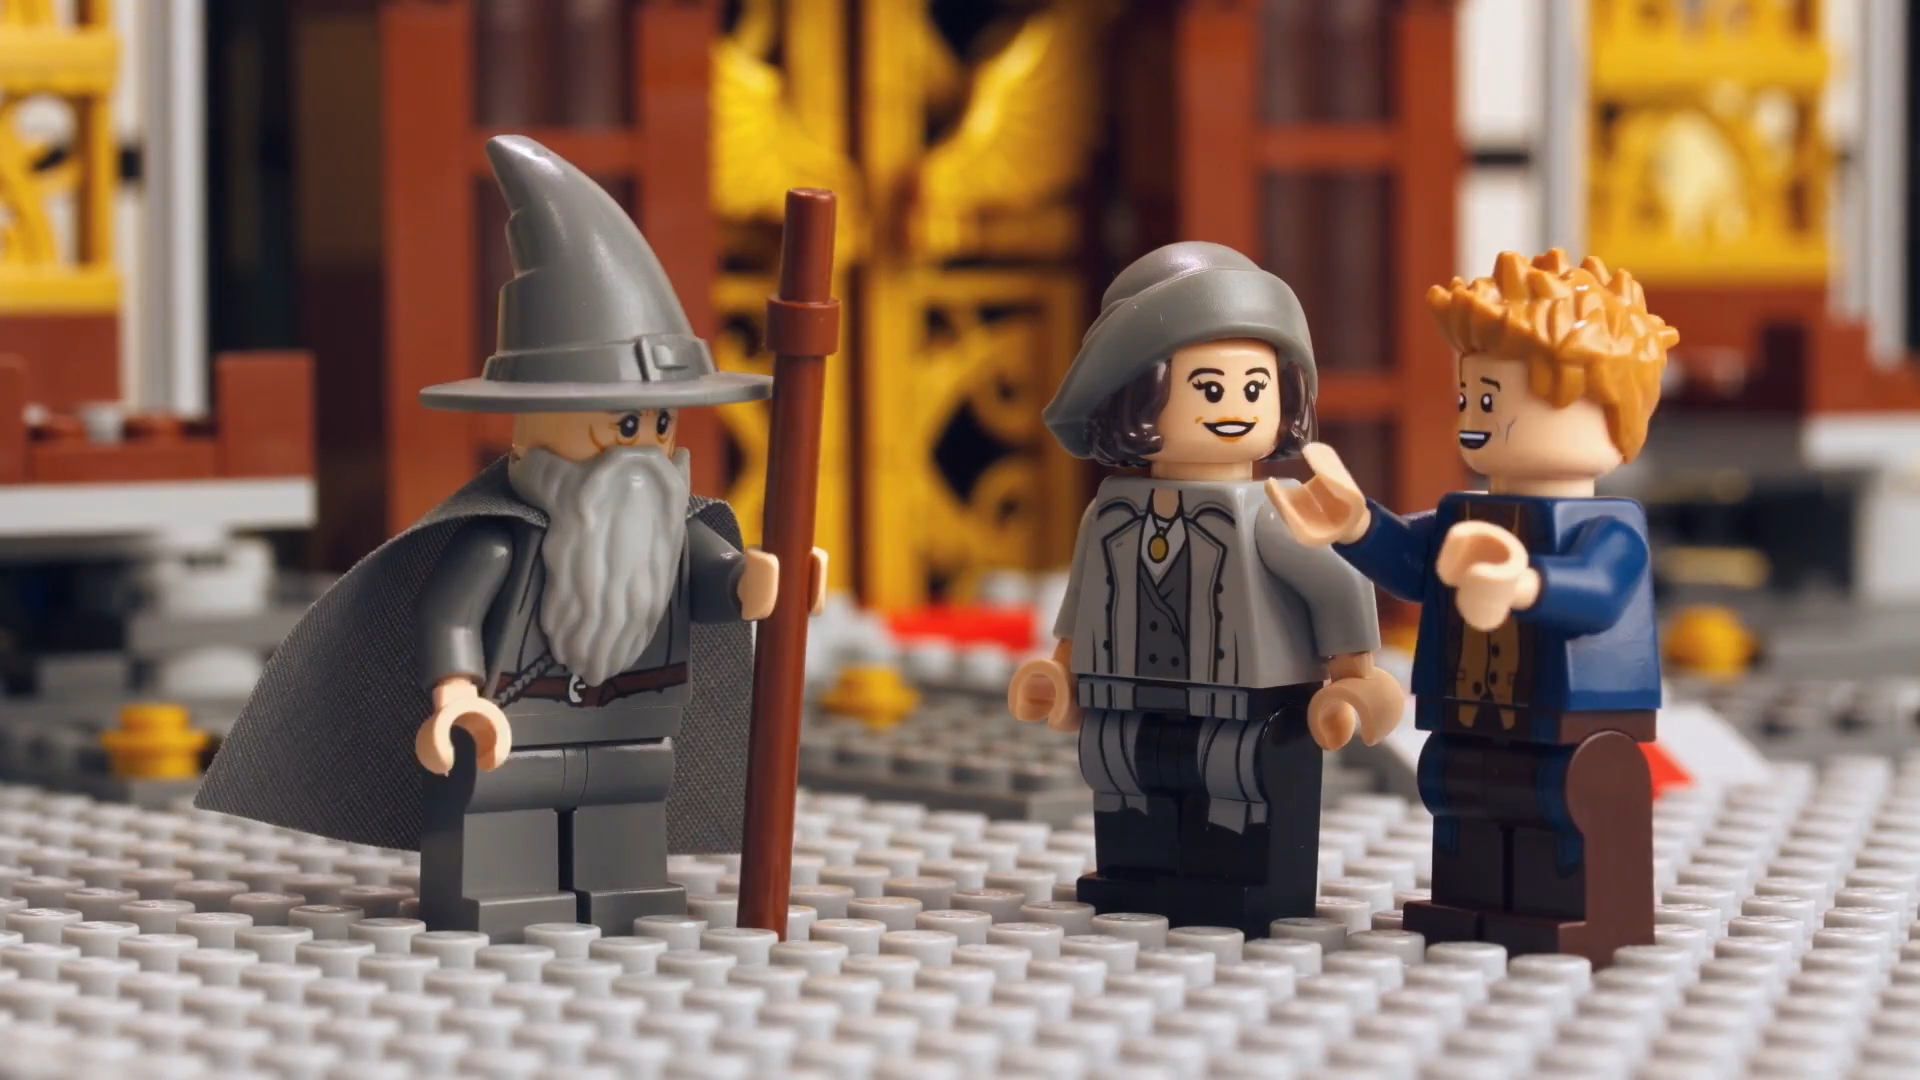 LEGO Dimensions: Gandalf Meets Newt Scamander